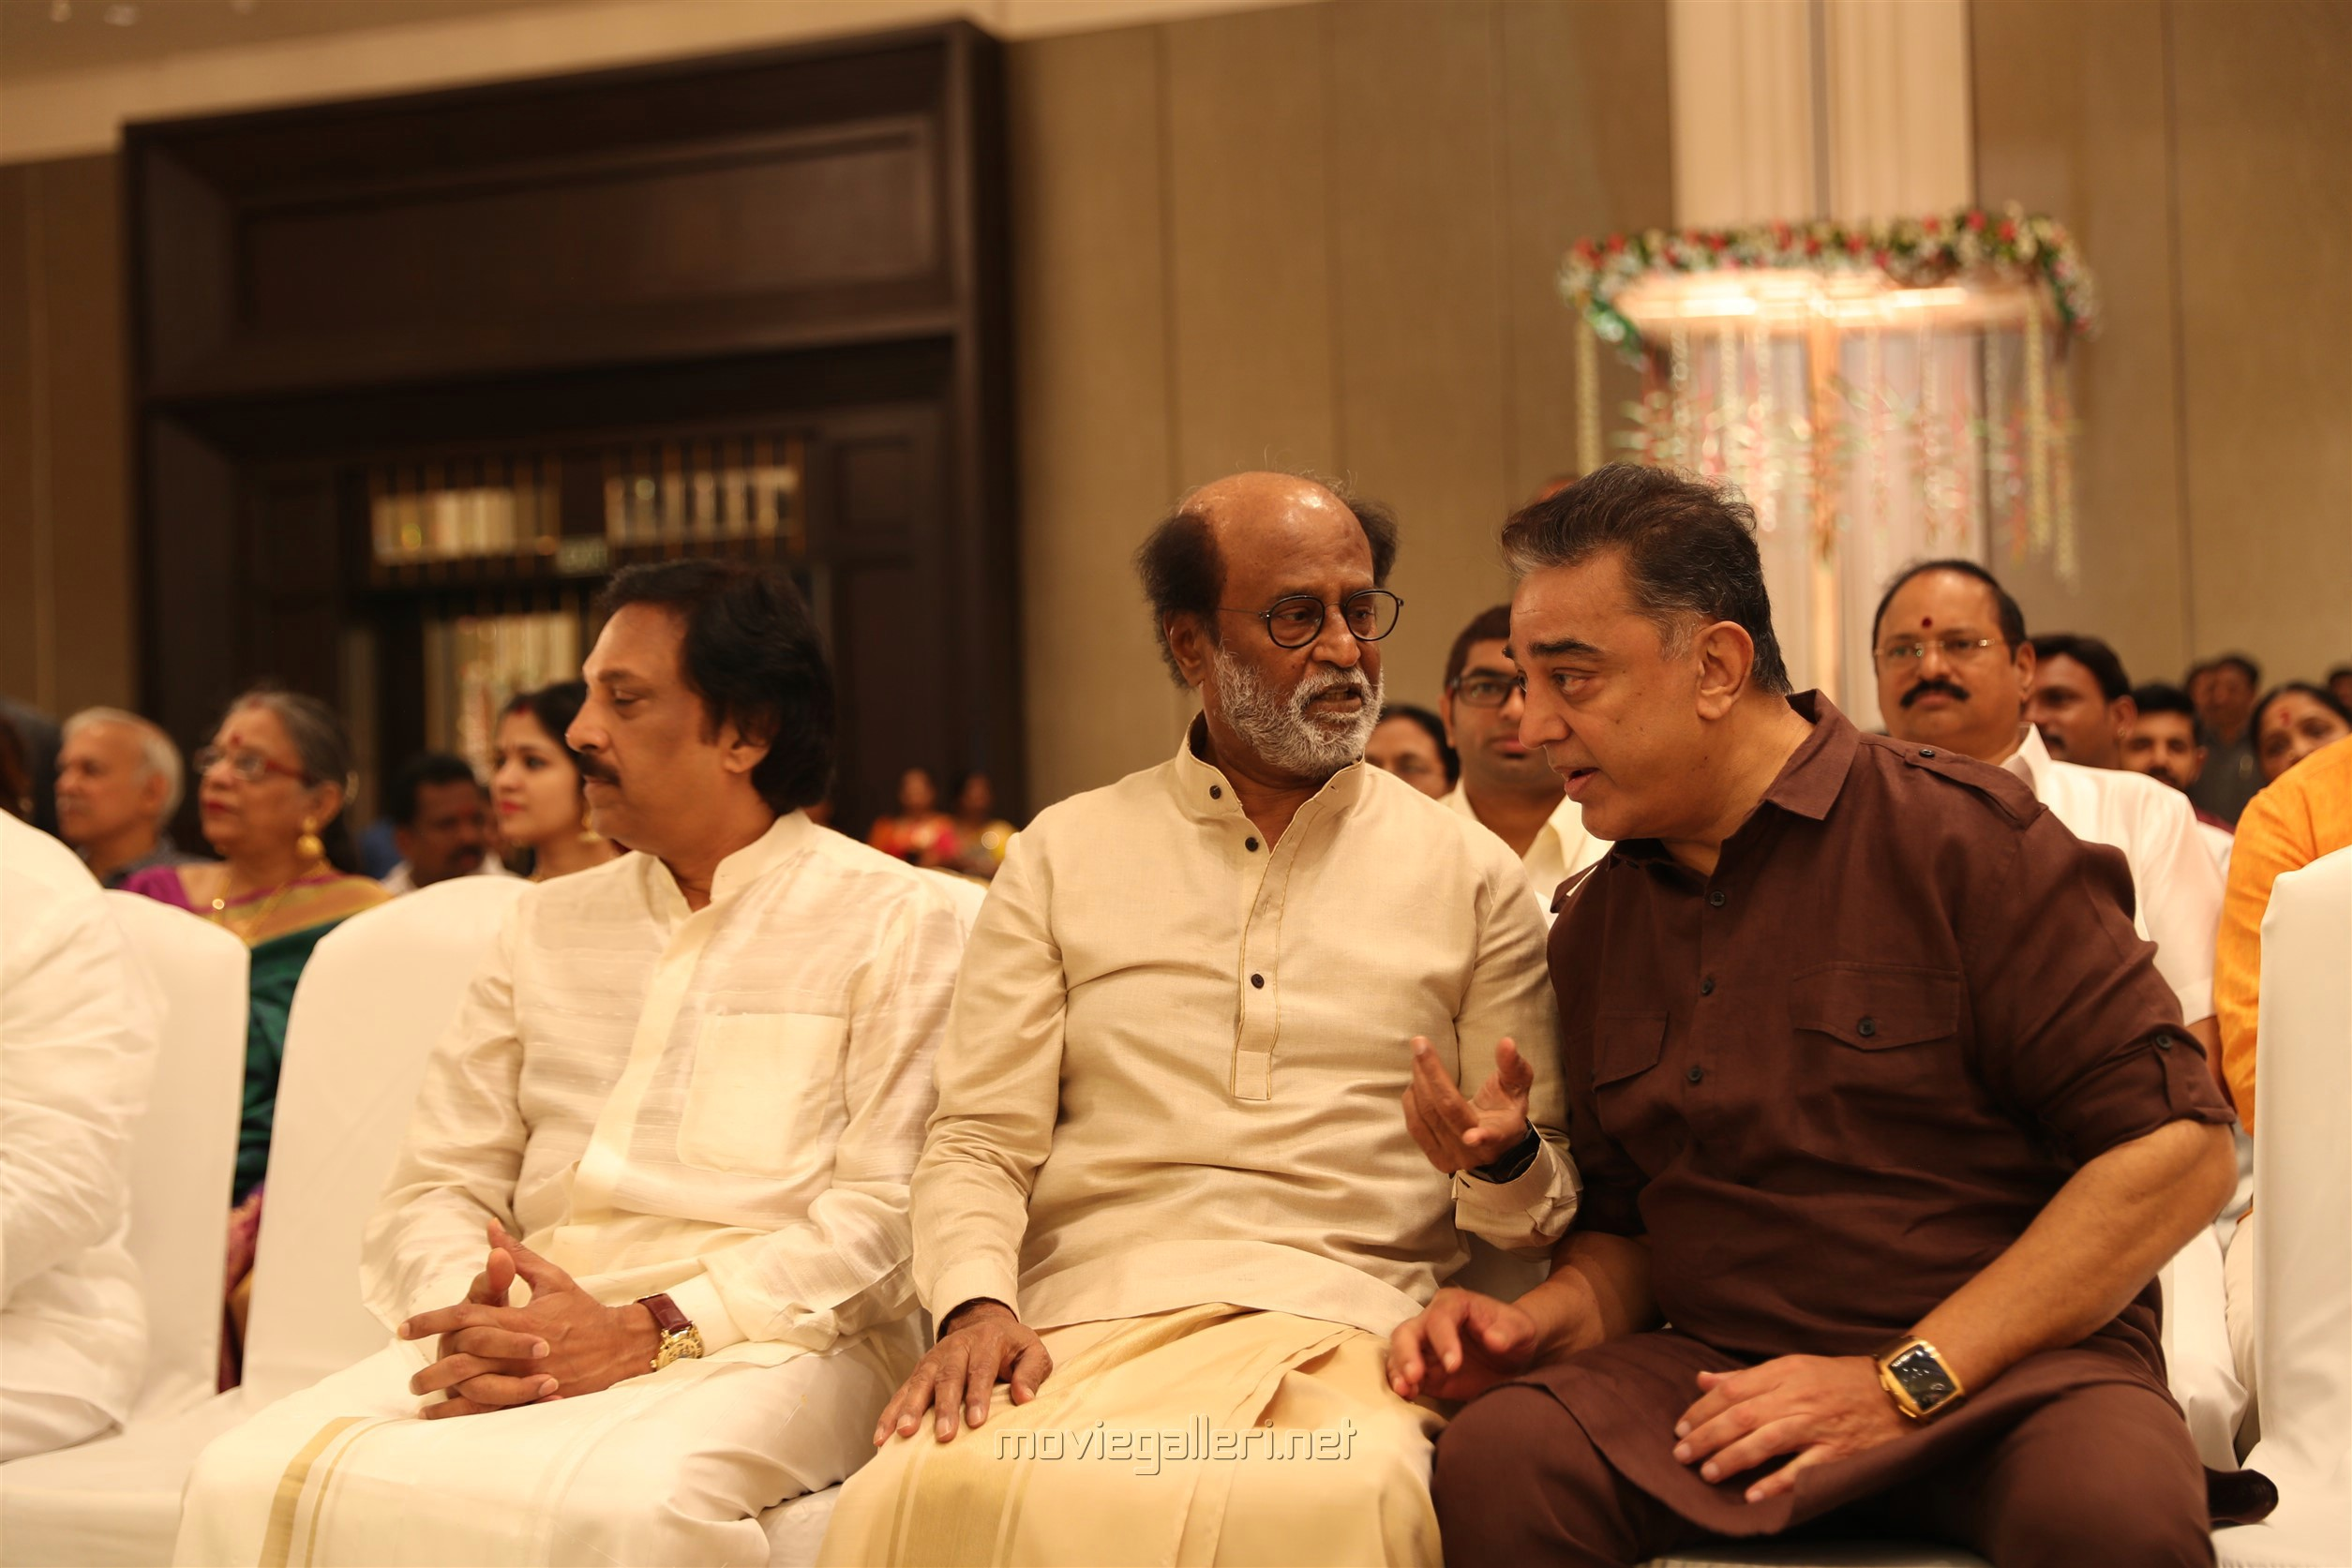 Ravi Raghavendra, Rajinikanth, Kamal Haasan @ Vishagan Soundarya Rajinikanth Marriage Photos HD